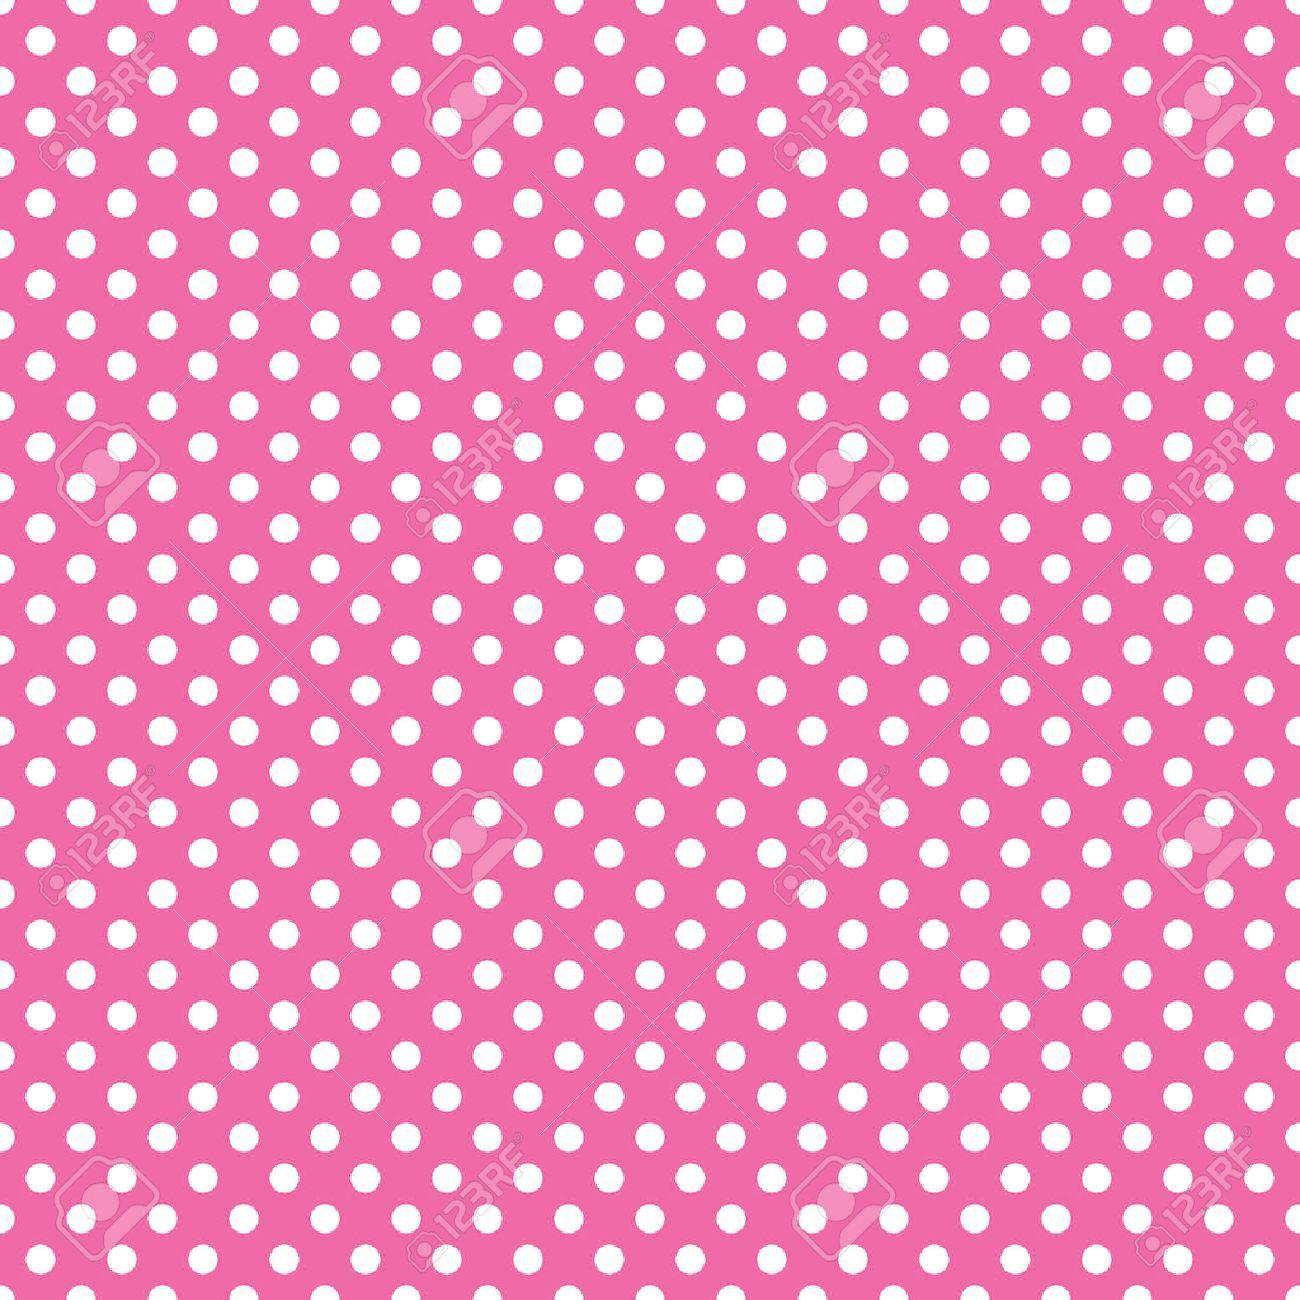 seamless pink polka dot background - 37702628